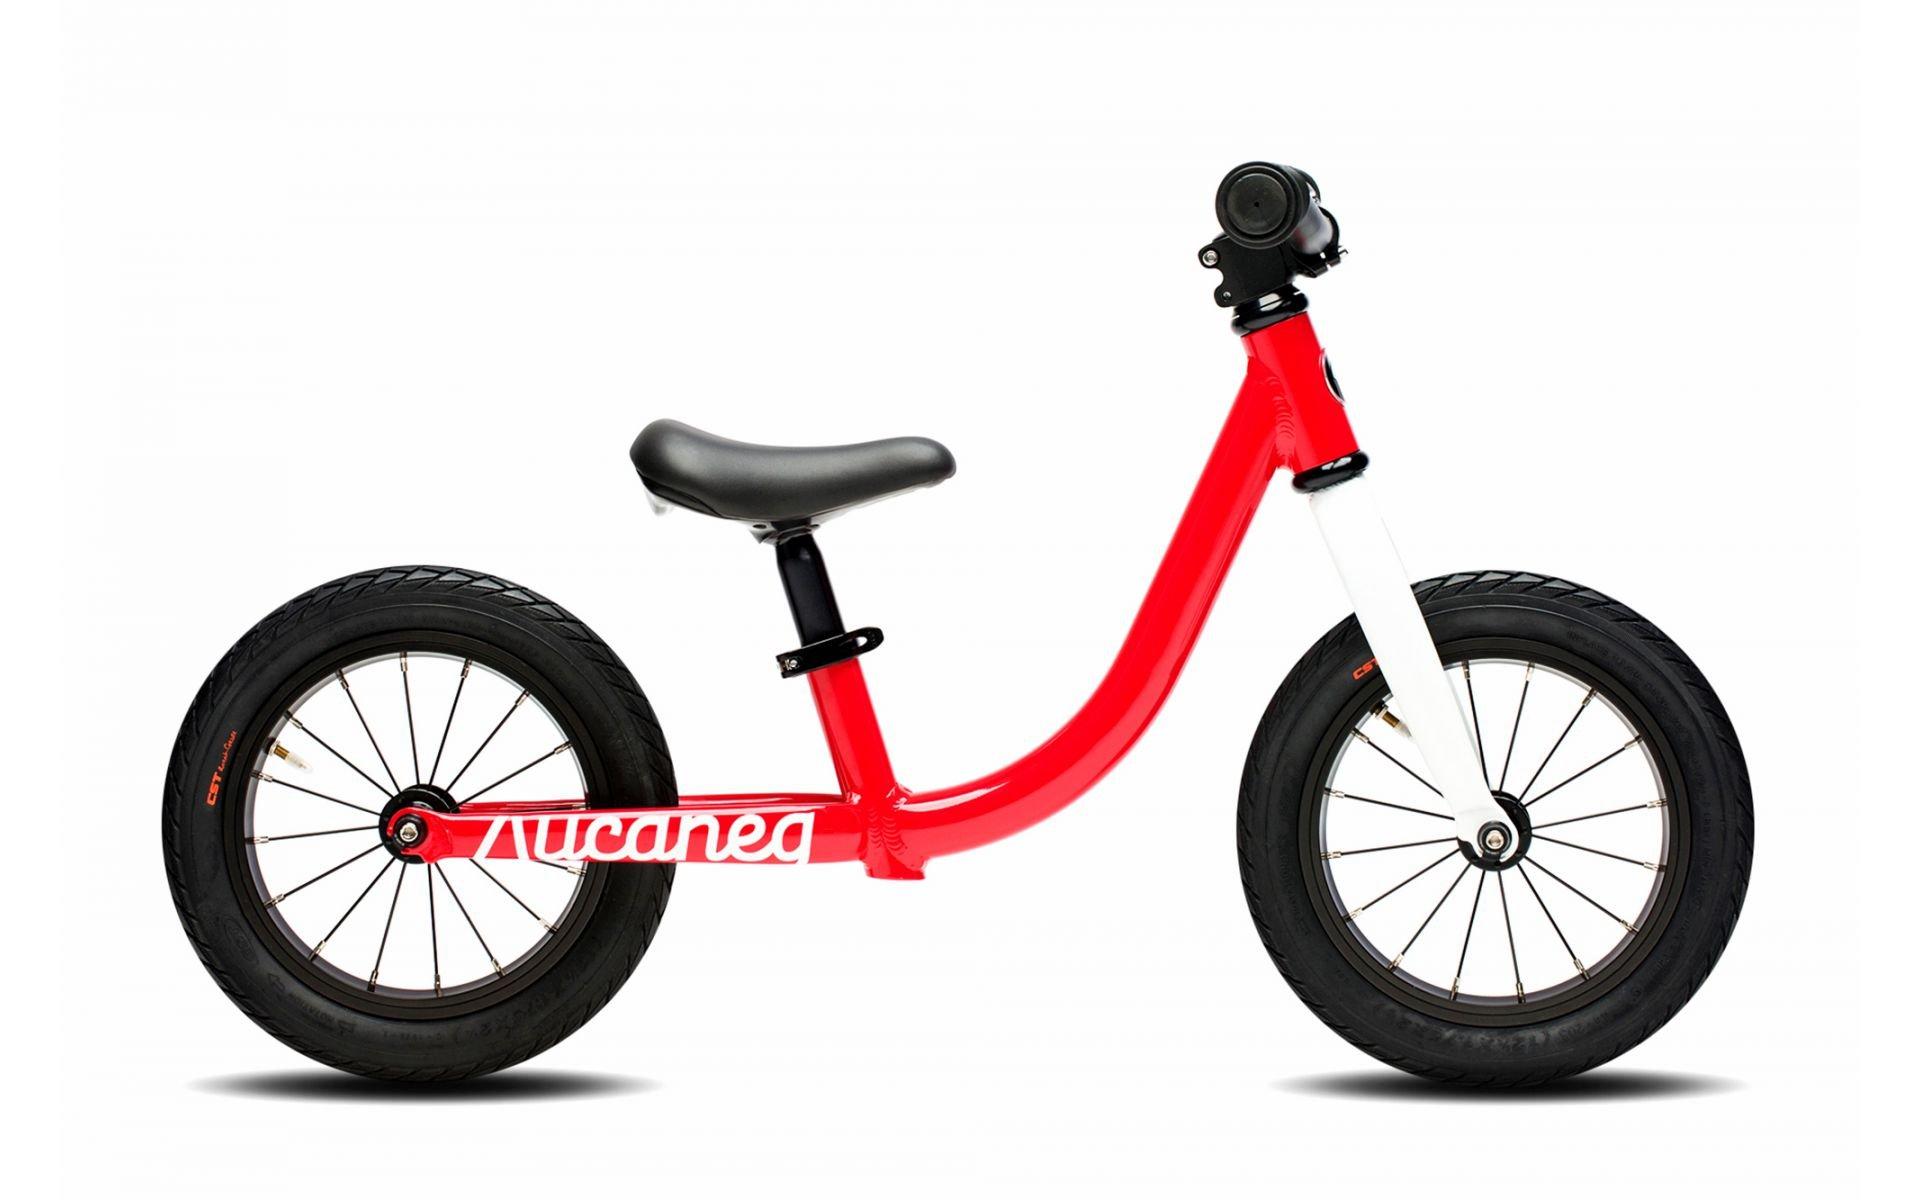 Balance Bicycle Lisaped 12 Bike (Red)